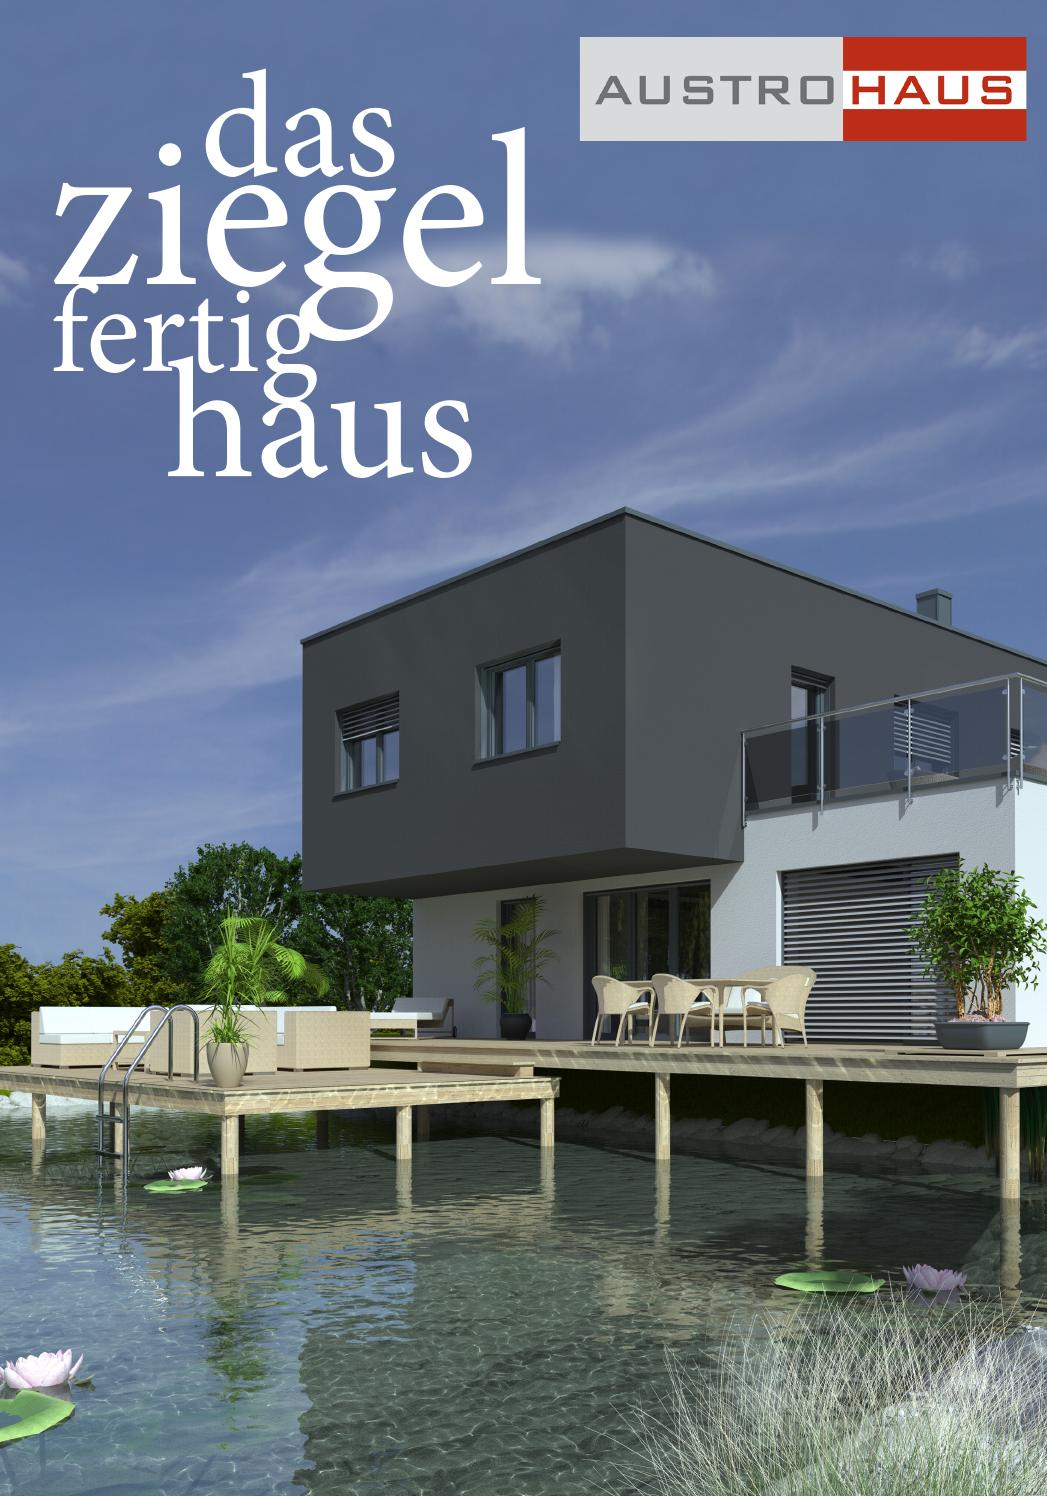 katalog austrohaus 2015 by etzi haus issuu. Black Bedroom Furniture Sets. Home Design Ideas